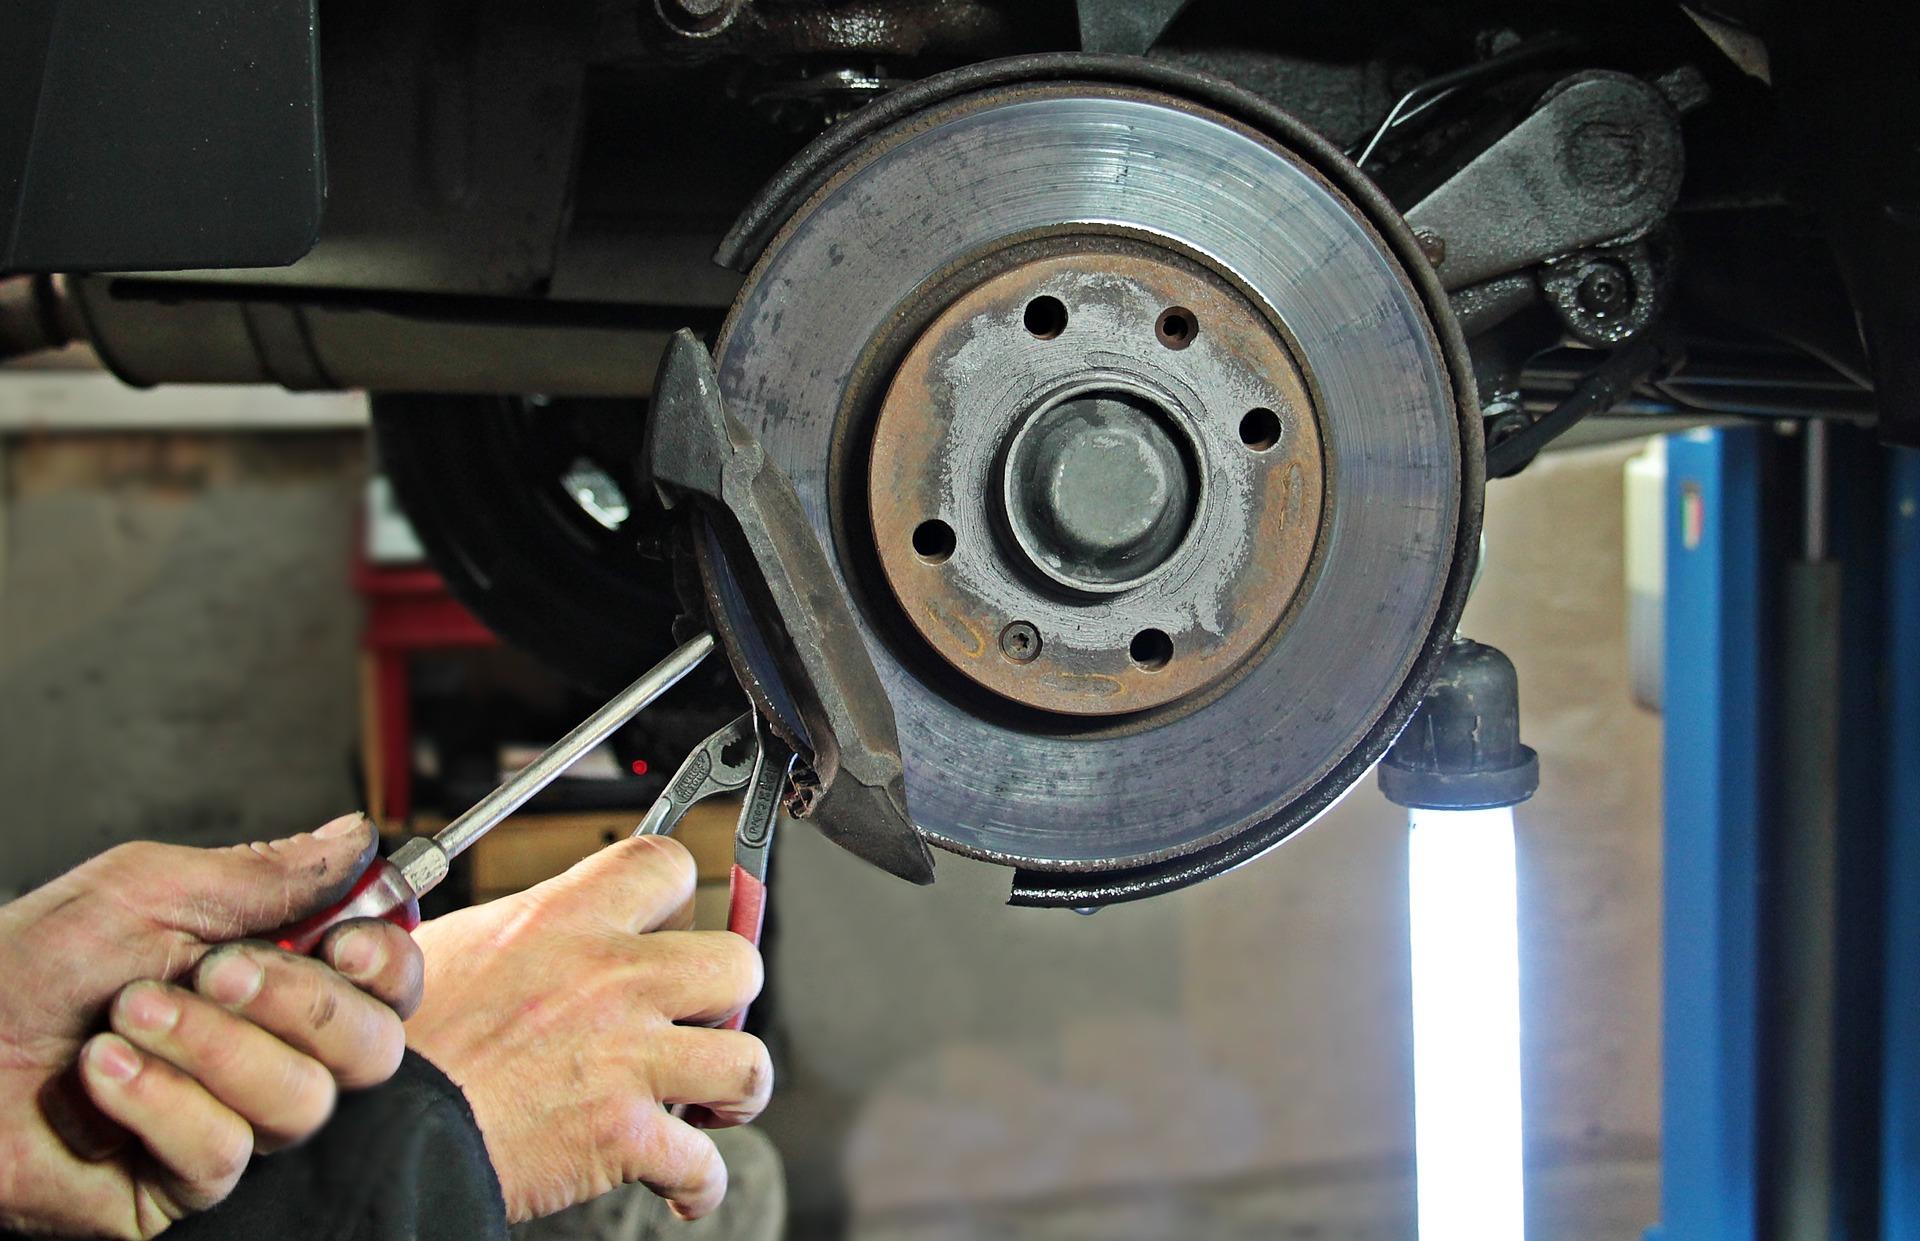 201804GPAAML-862-9176-7 auto-repair-1954636_1920